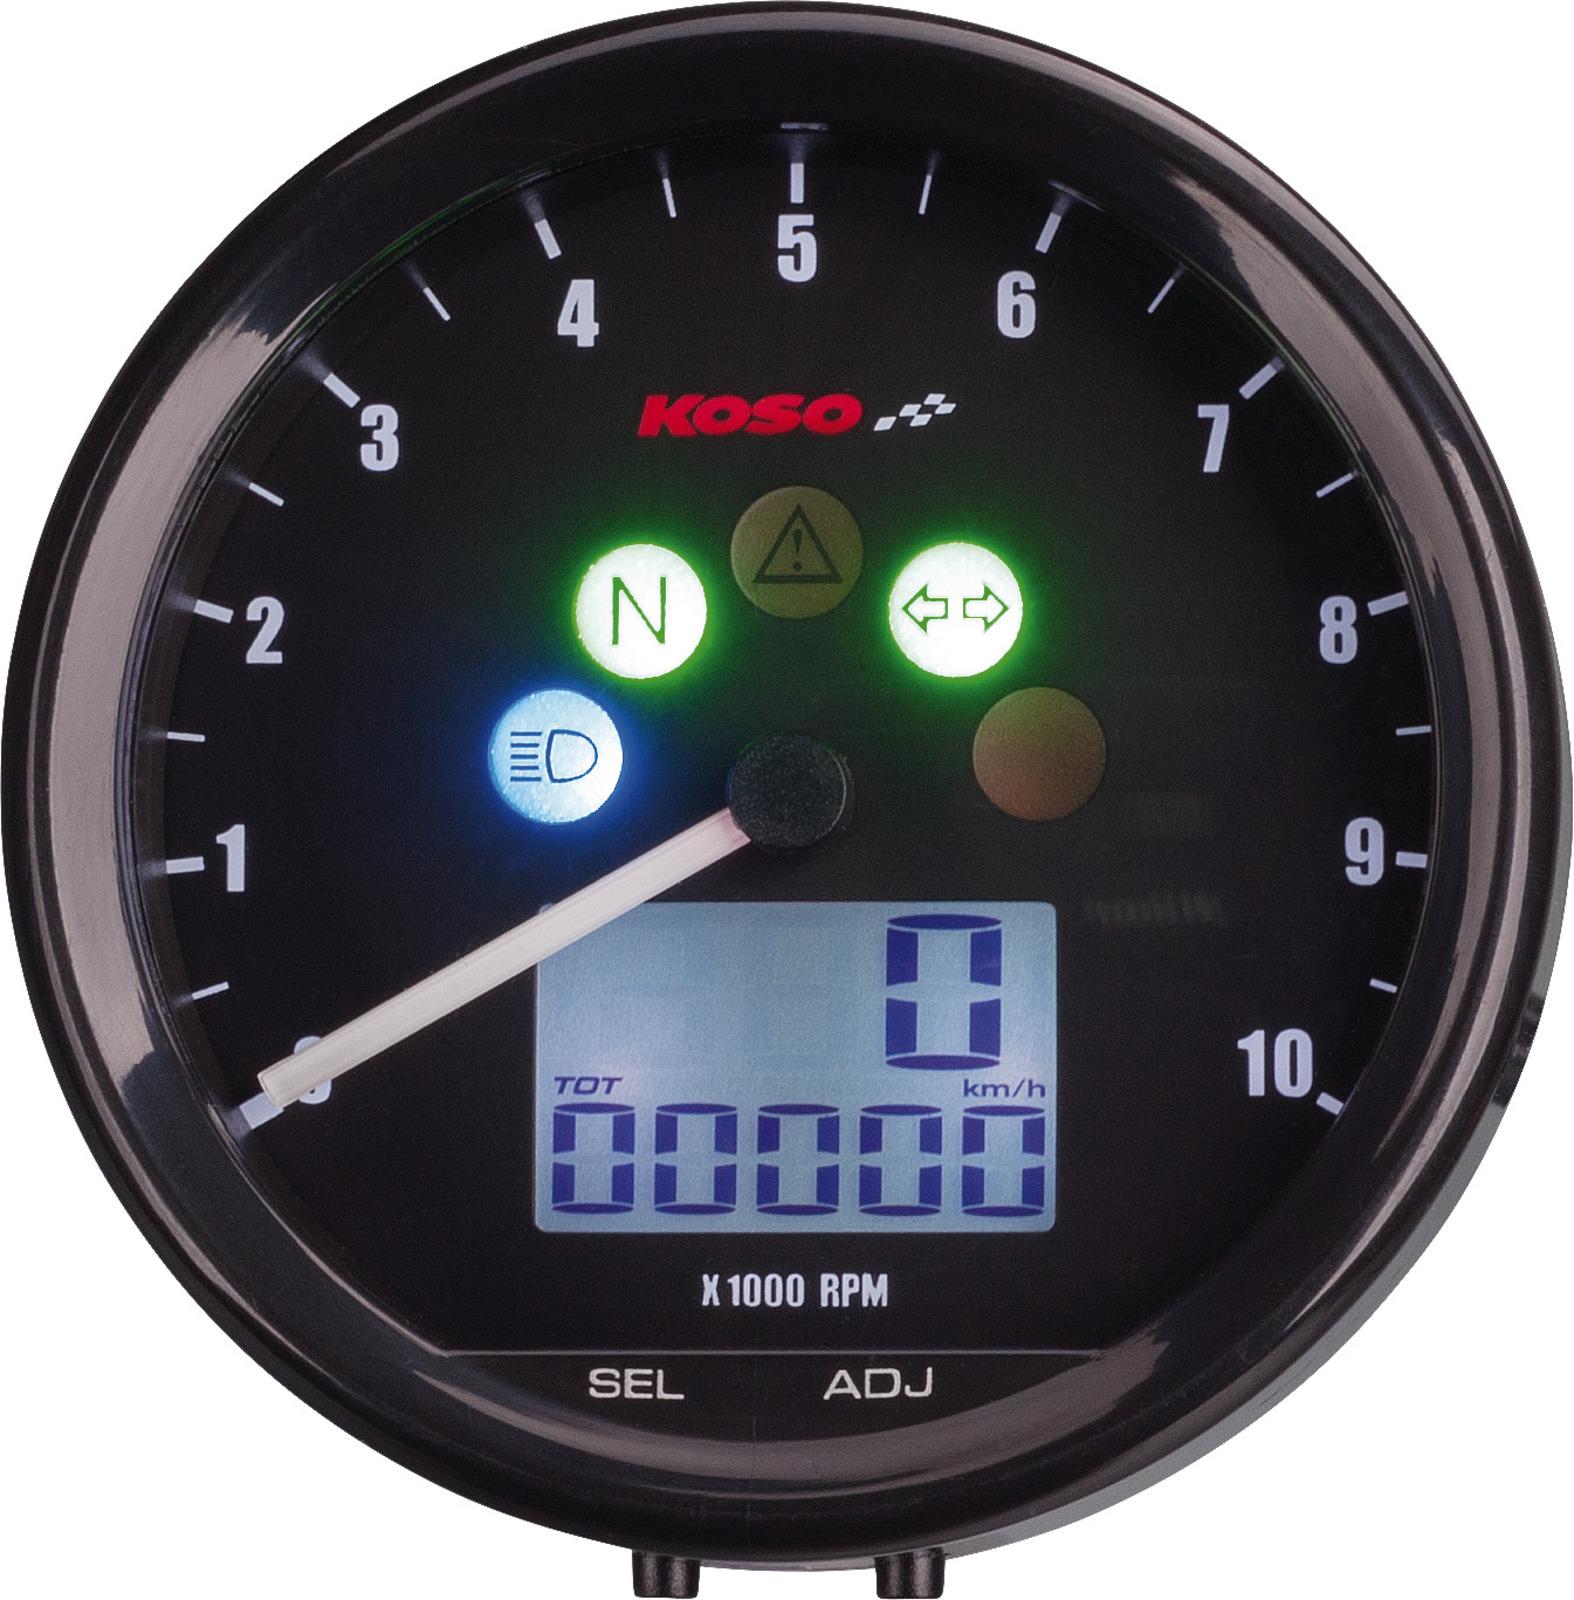 KOSO All In One Tachometer /'TNT 64/' 12V Drehzahlmesser in analoger Optik